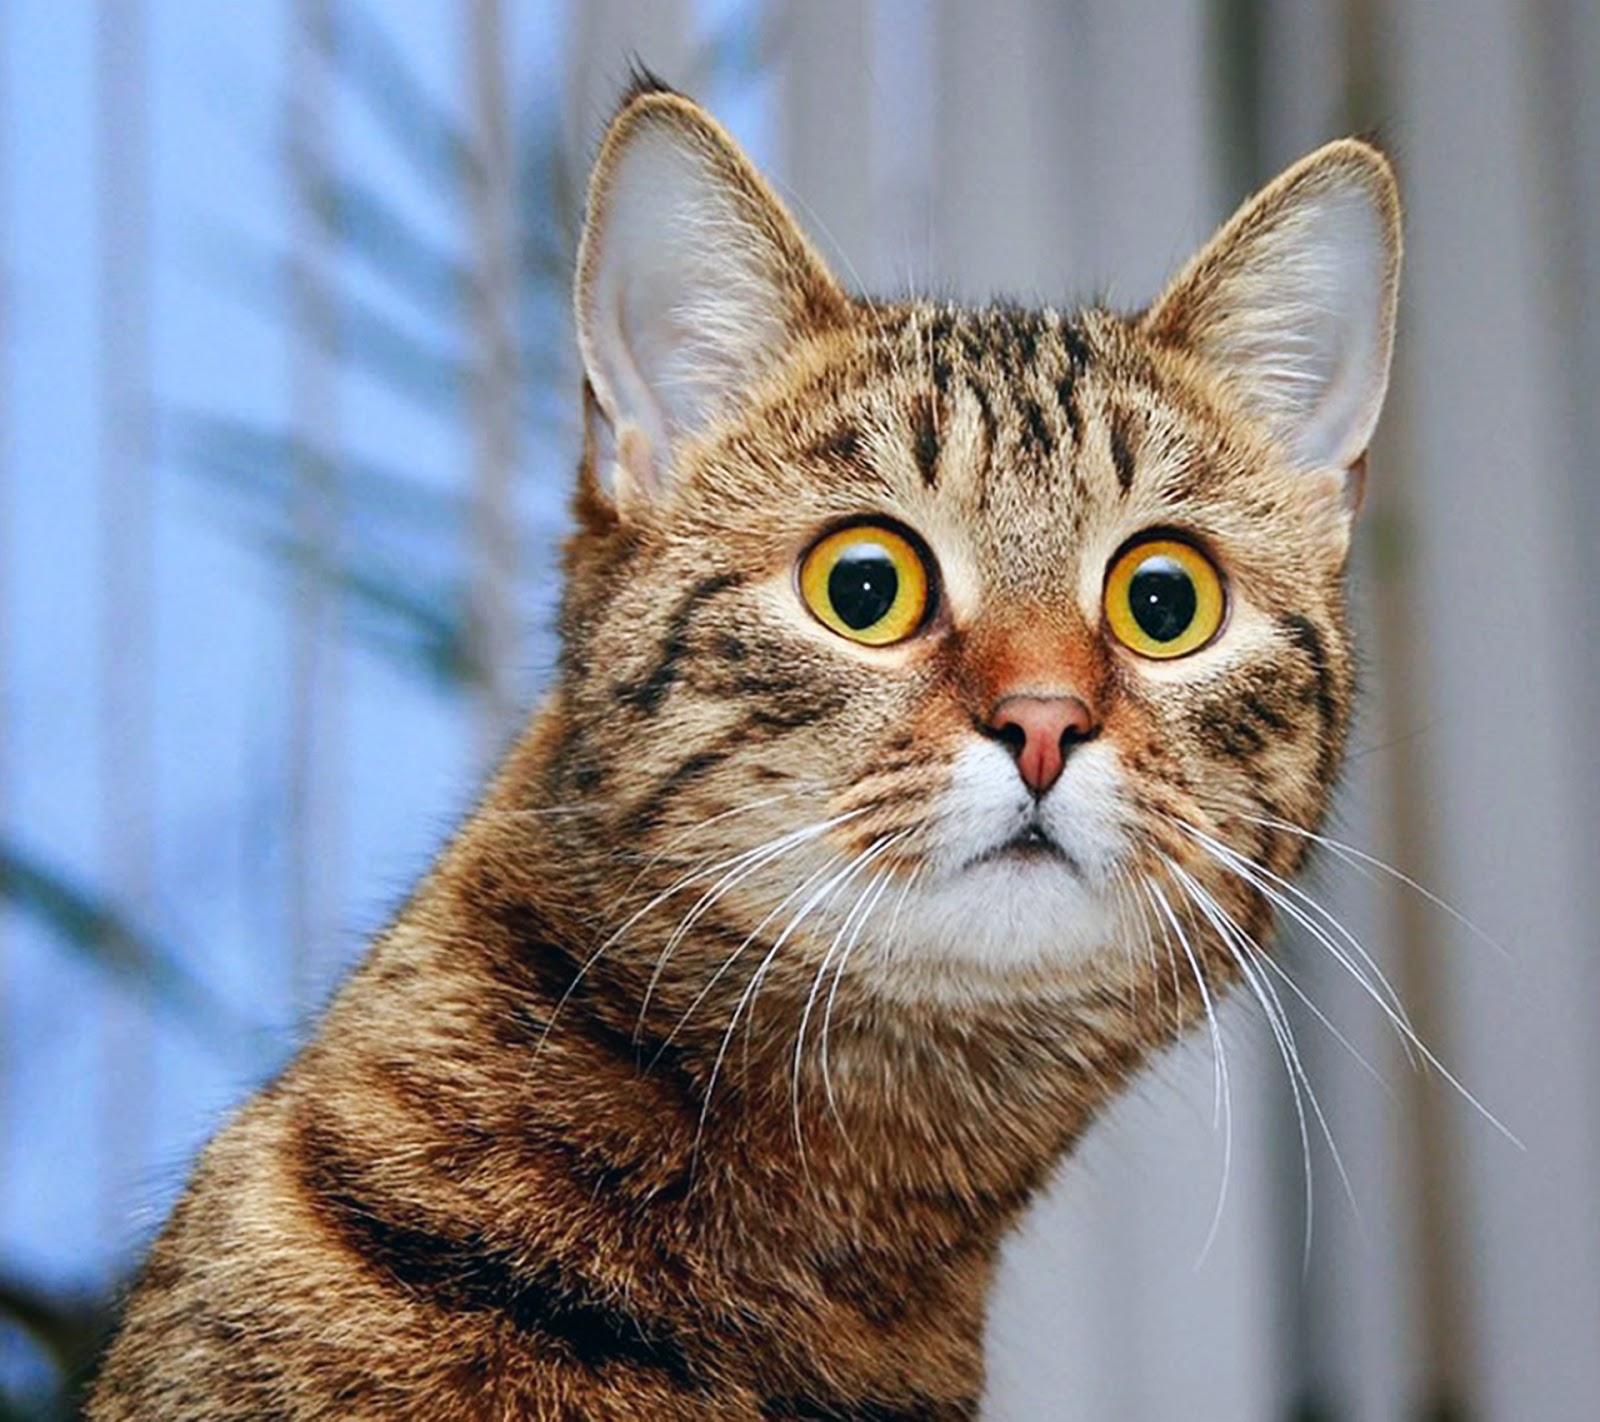 imagenes animales graciosas - Todo Mascotas: Imágenes graciosas de Animales y Mascotas